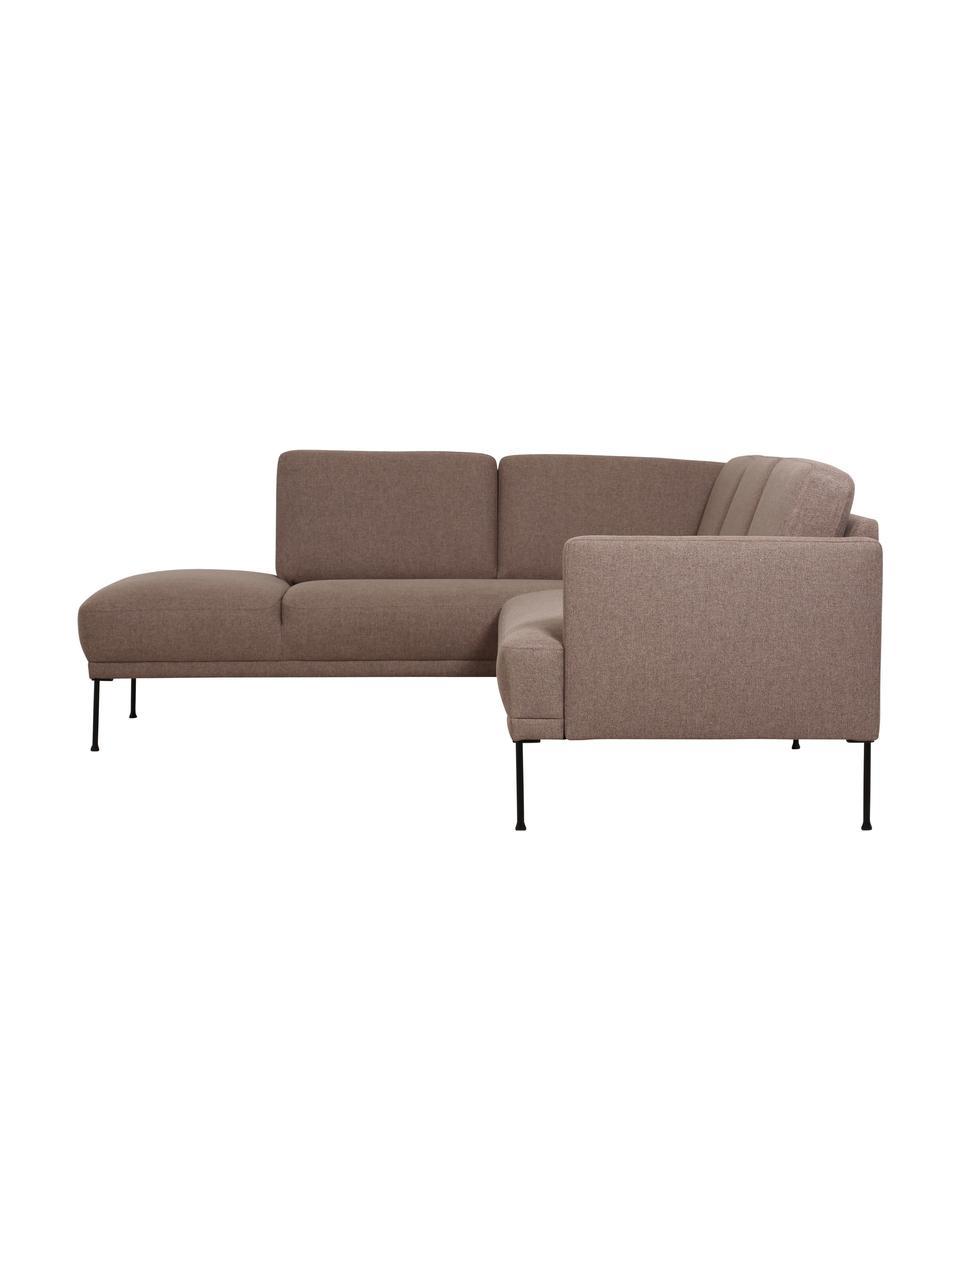 Canapé d'angle brun avec pieds en métal Fluente, Tissu brun